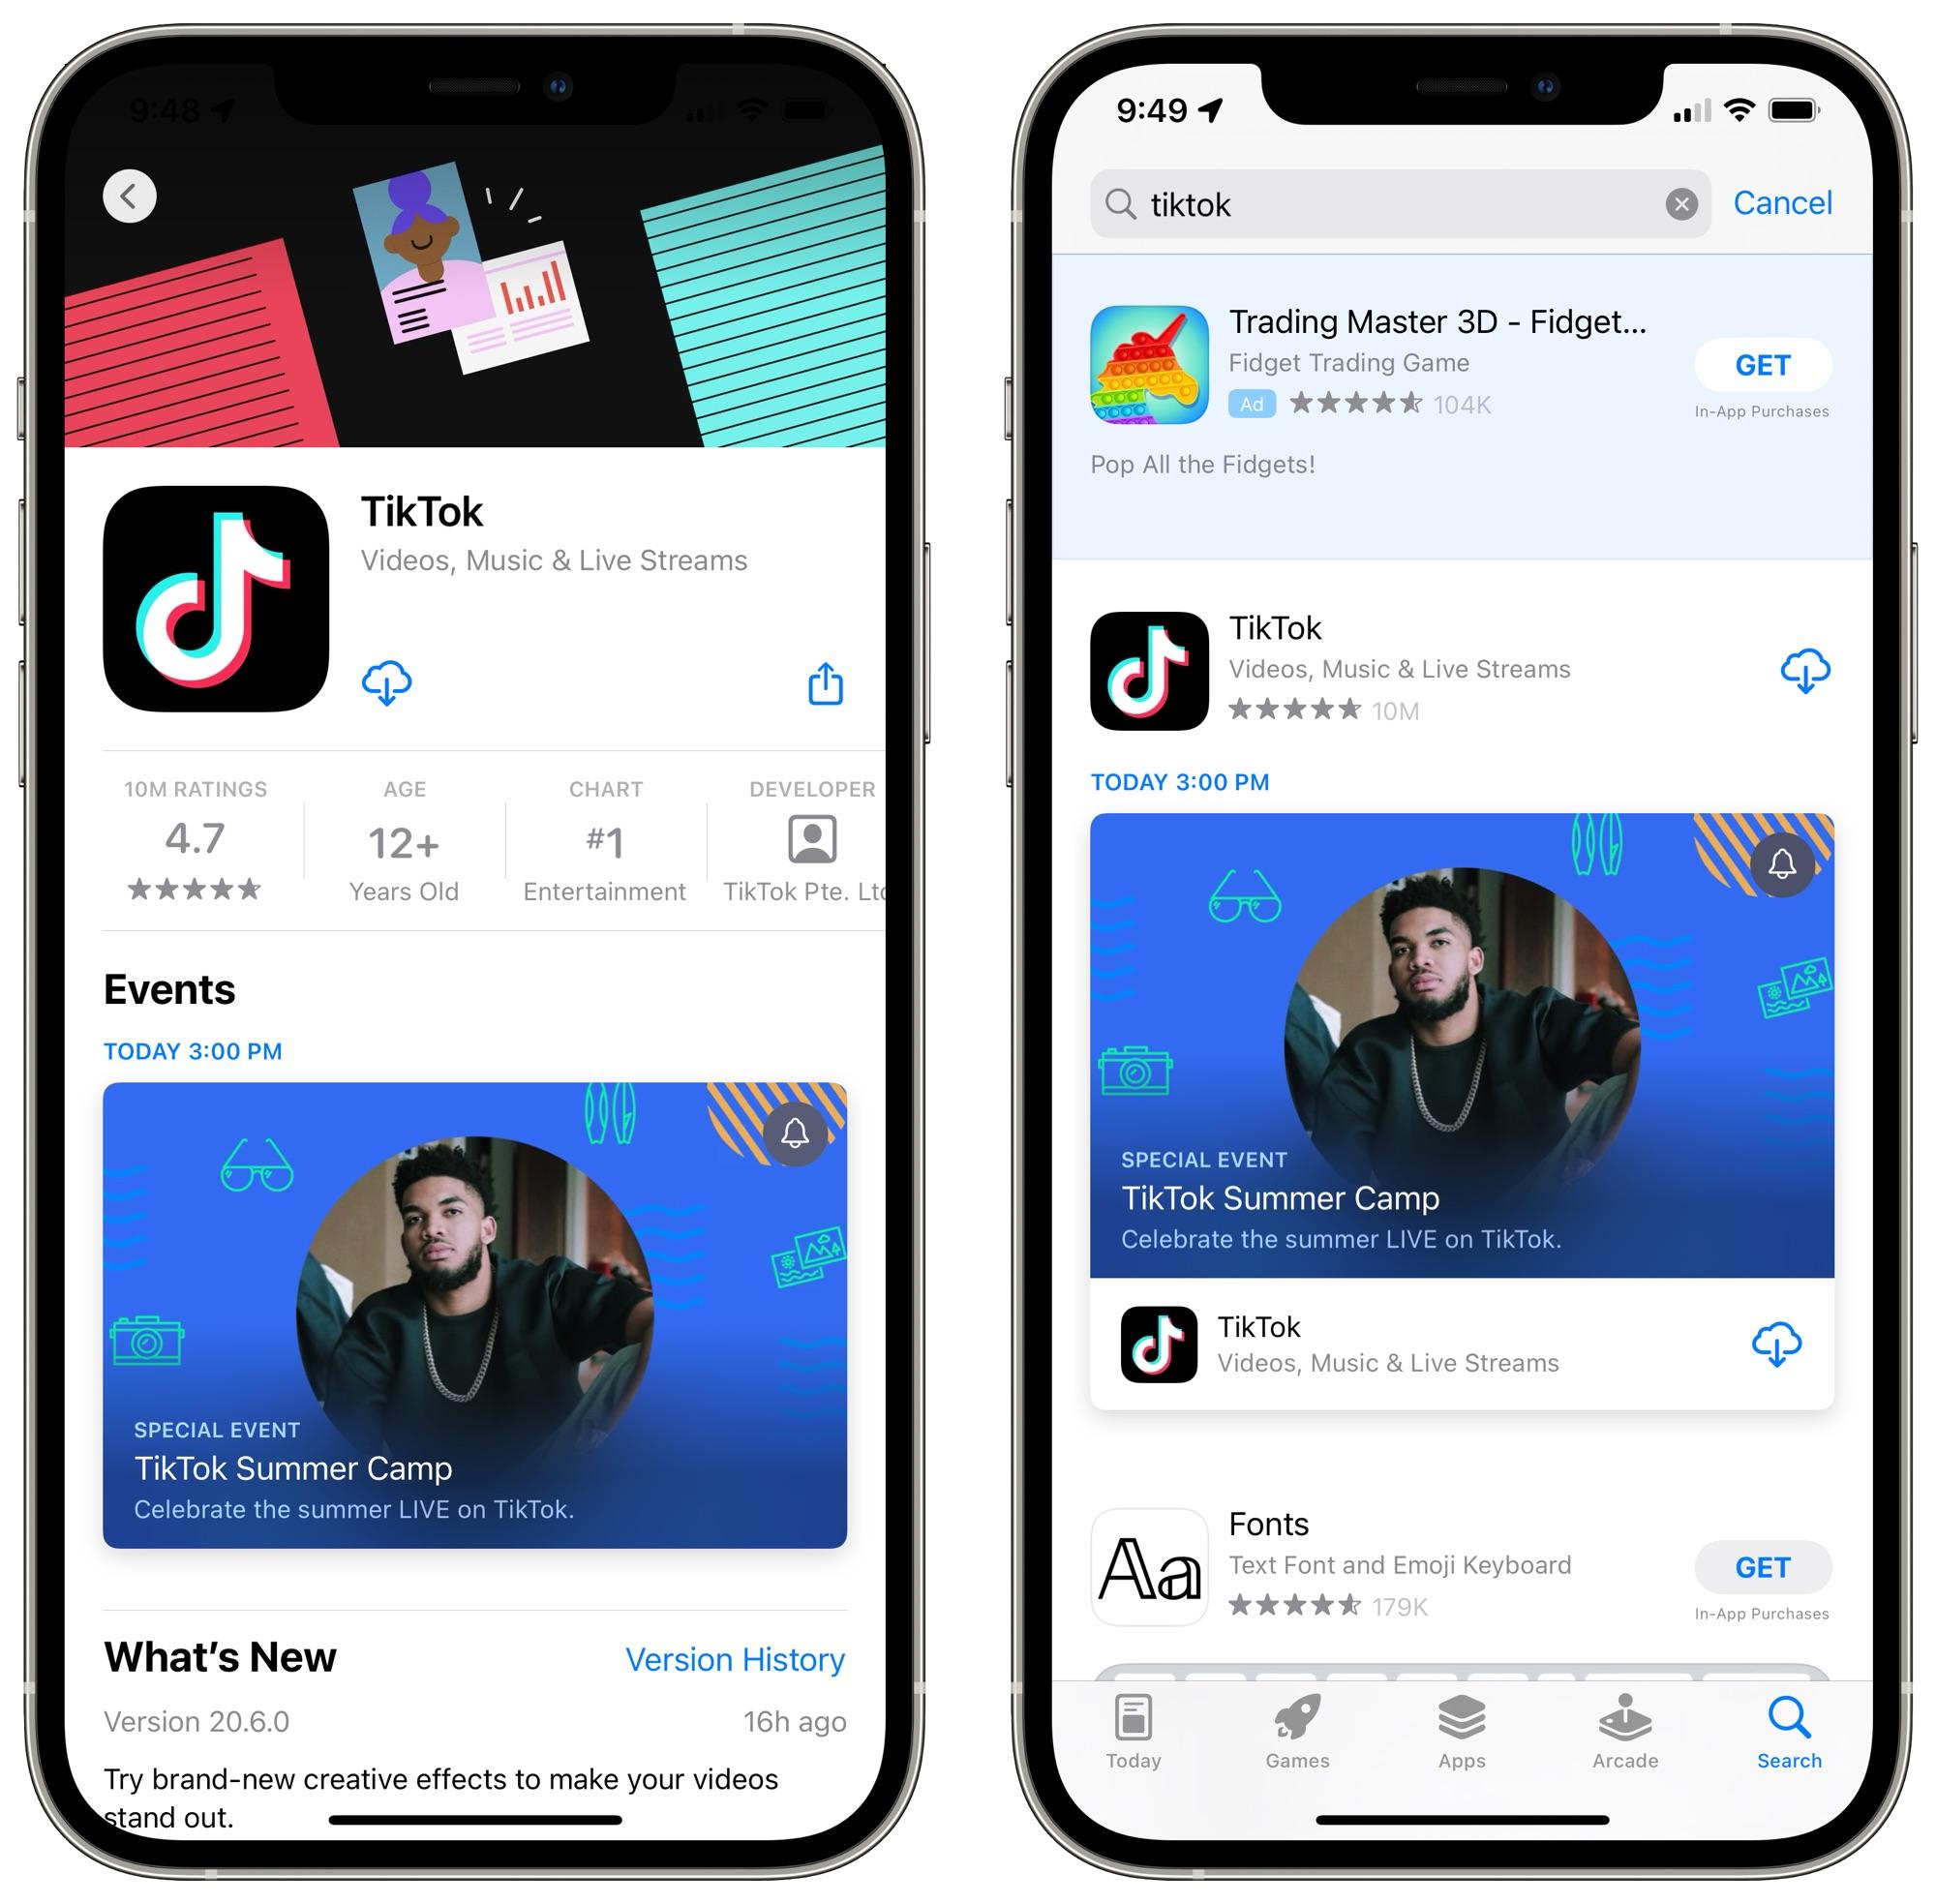 app store events ios 15 2